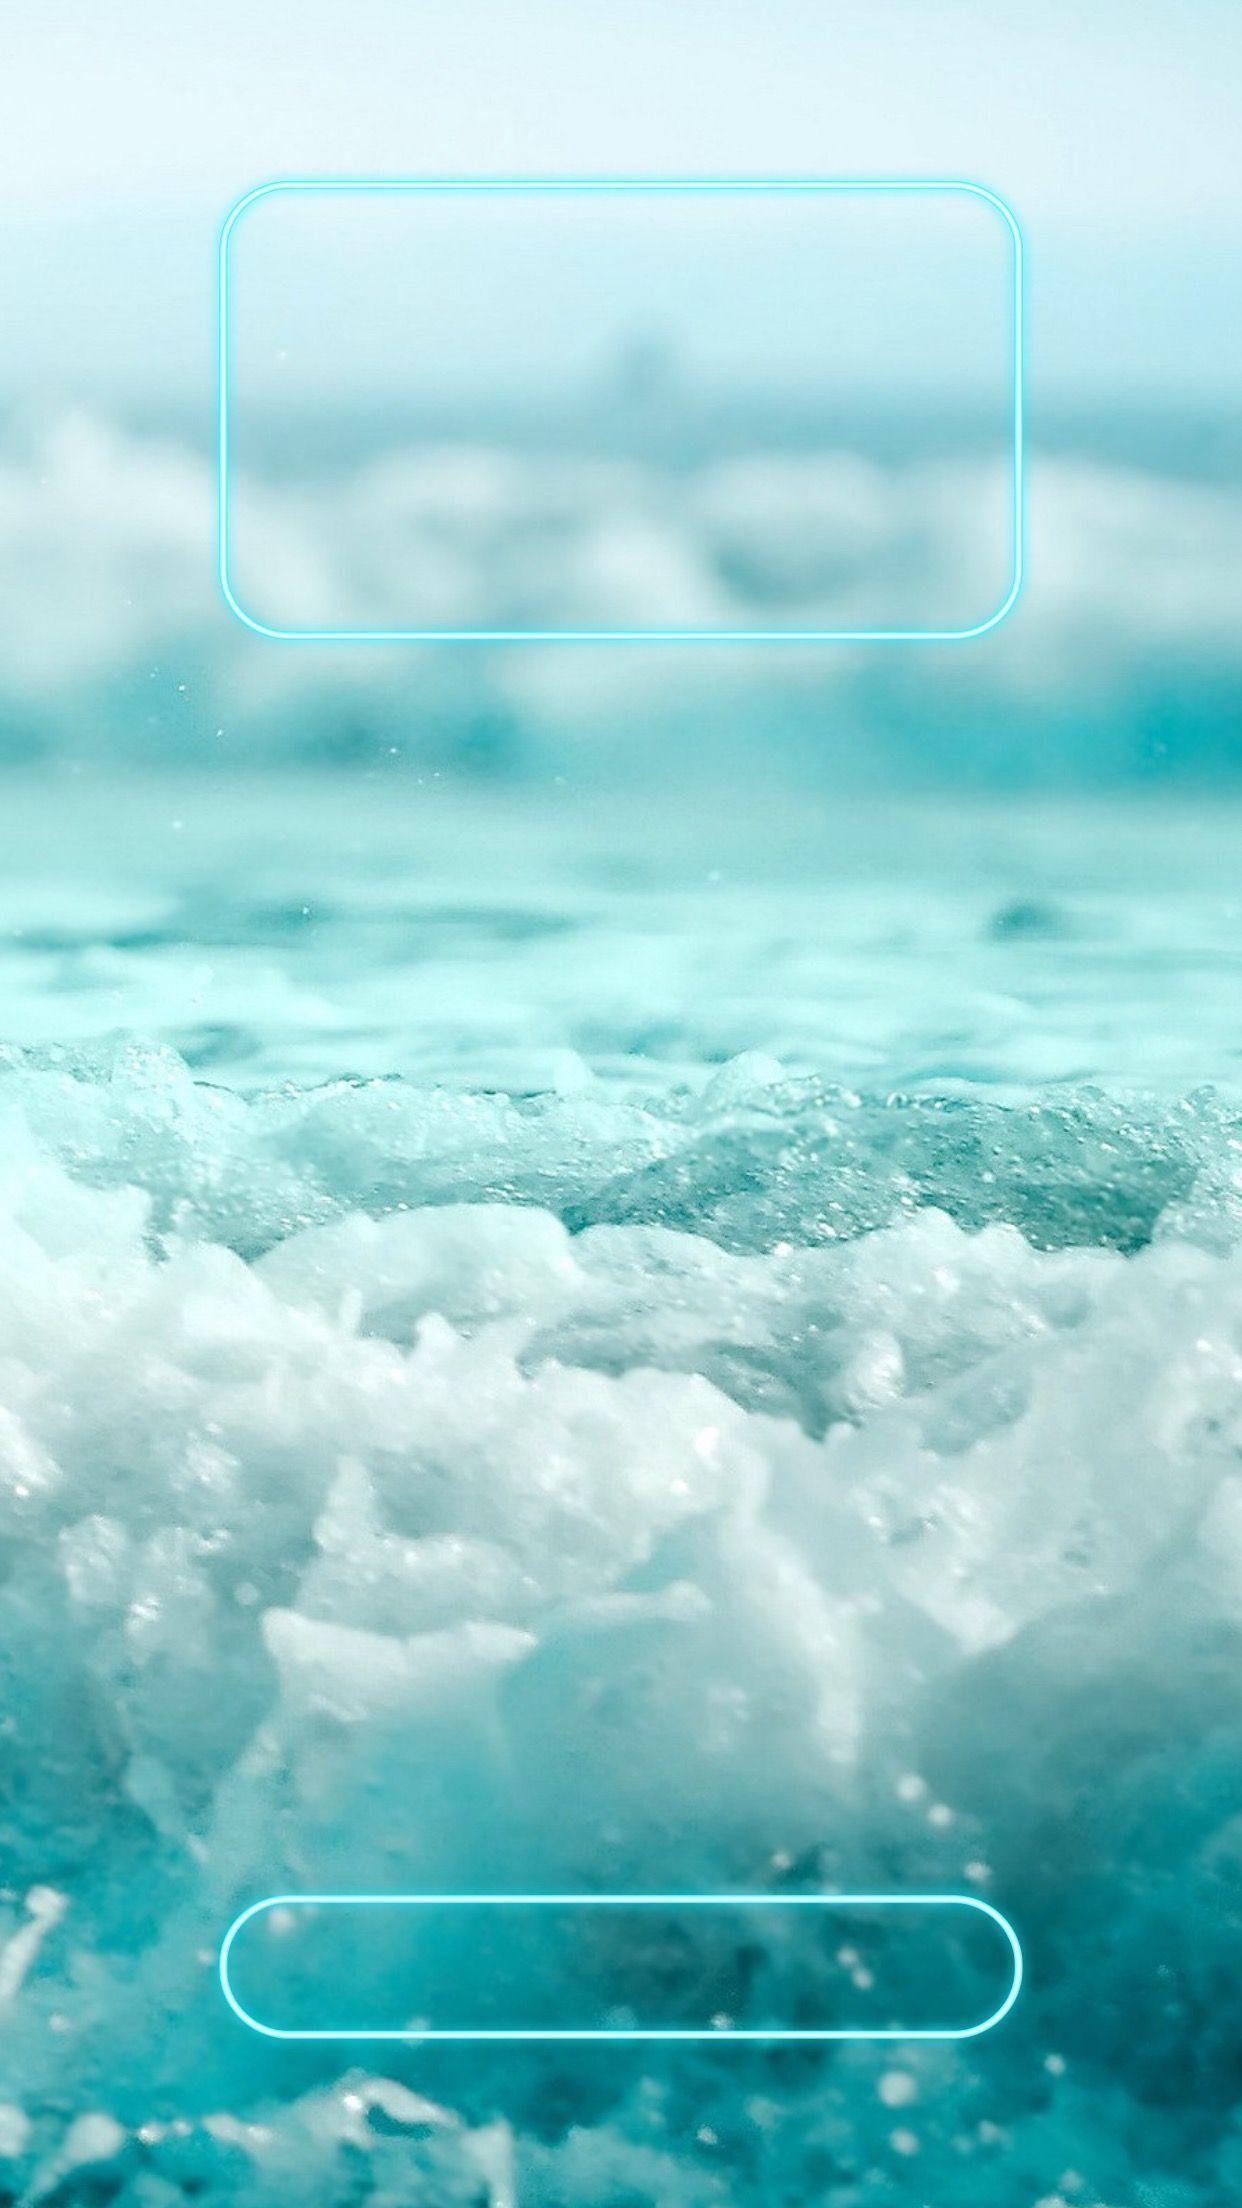 Iphone 6 Plus Screen Wallpapers Top Free Iphone 6 Plus